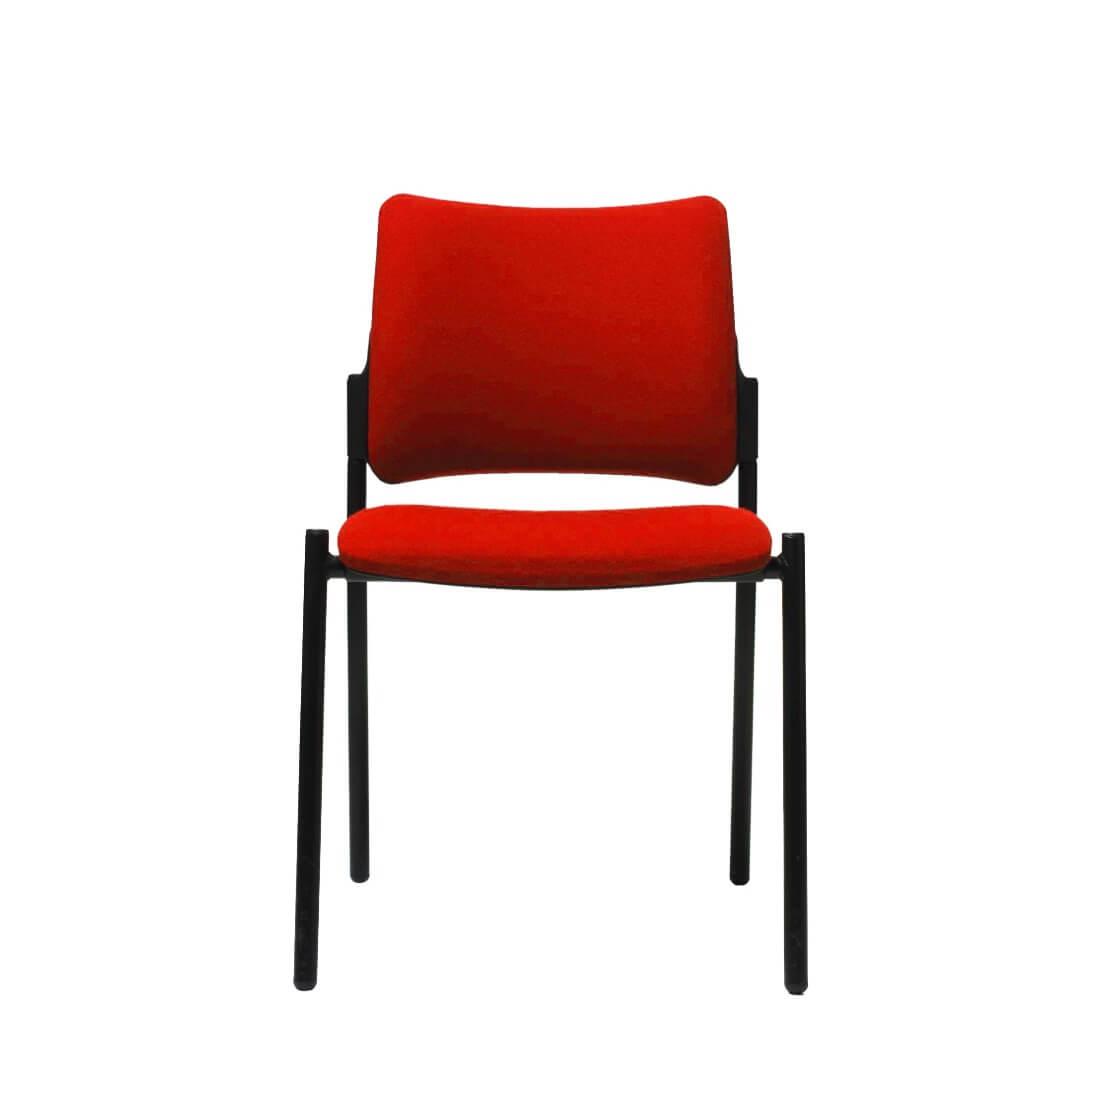 scaun rosu cafenea